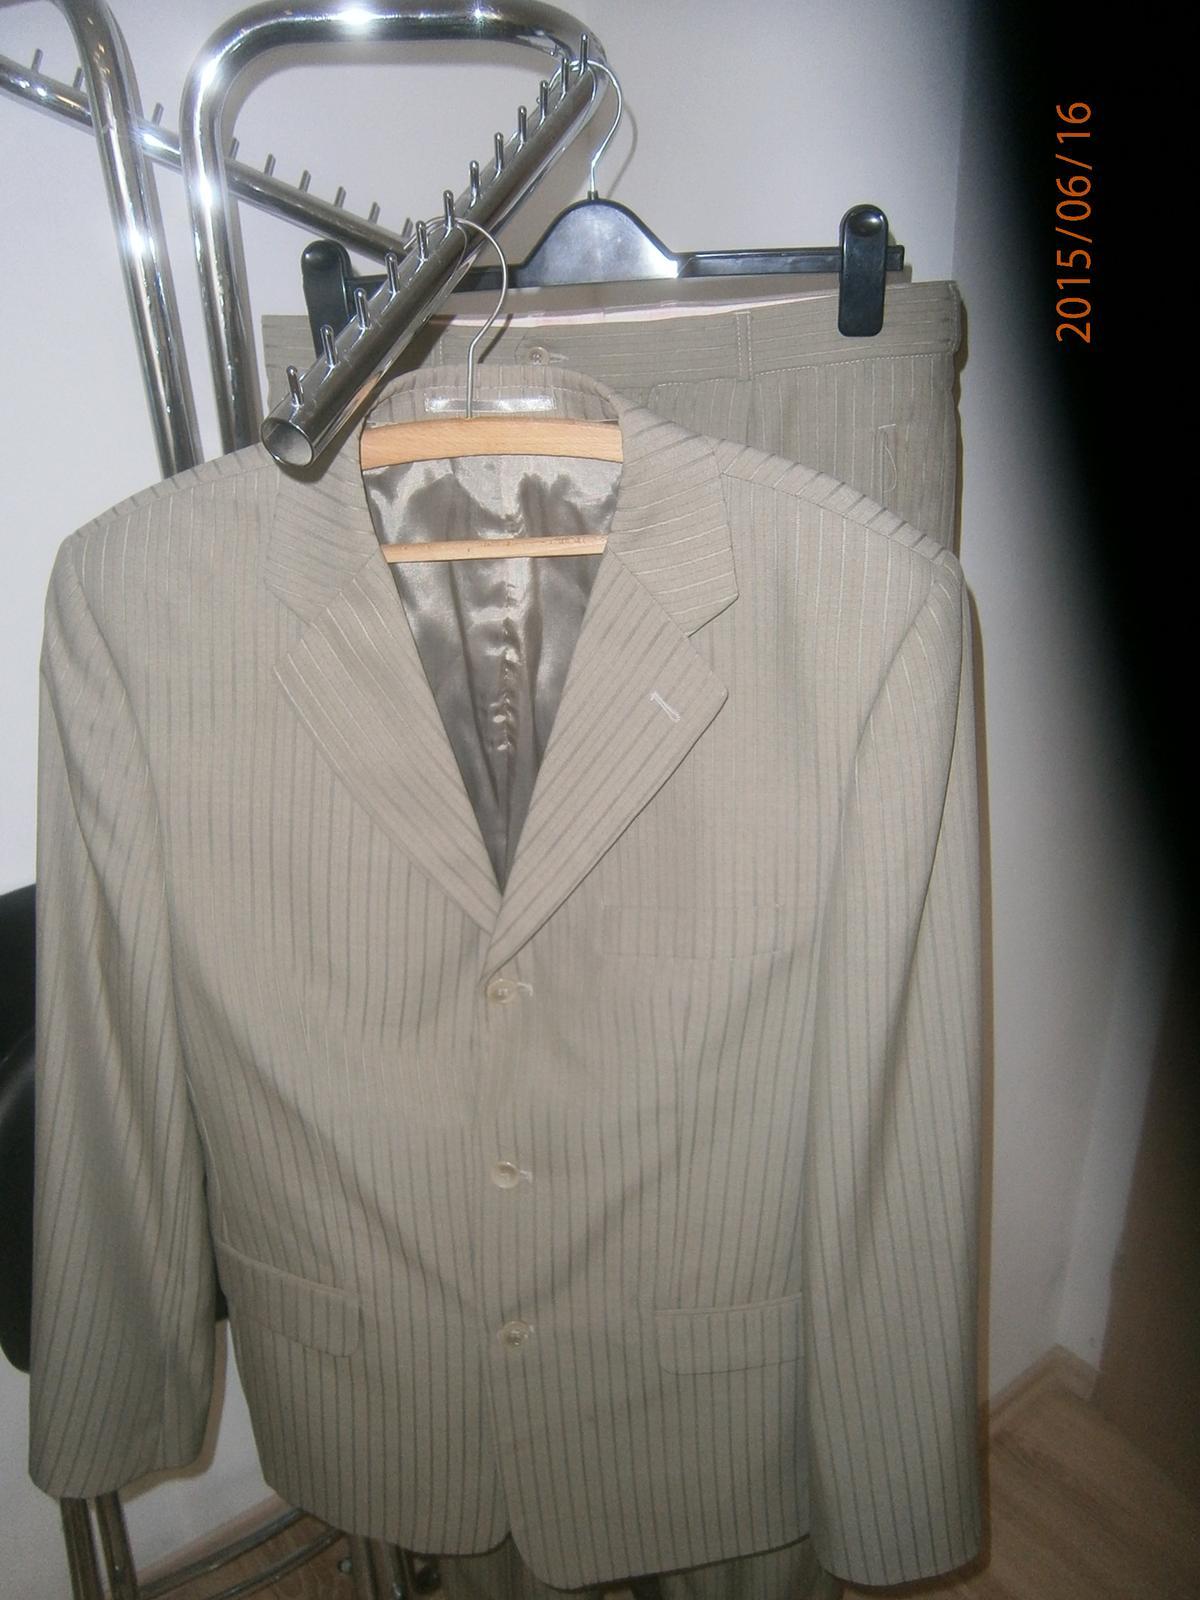 oblek-sako ,vesta,kalhoty, vel.50 - Obrázek č. 1